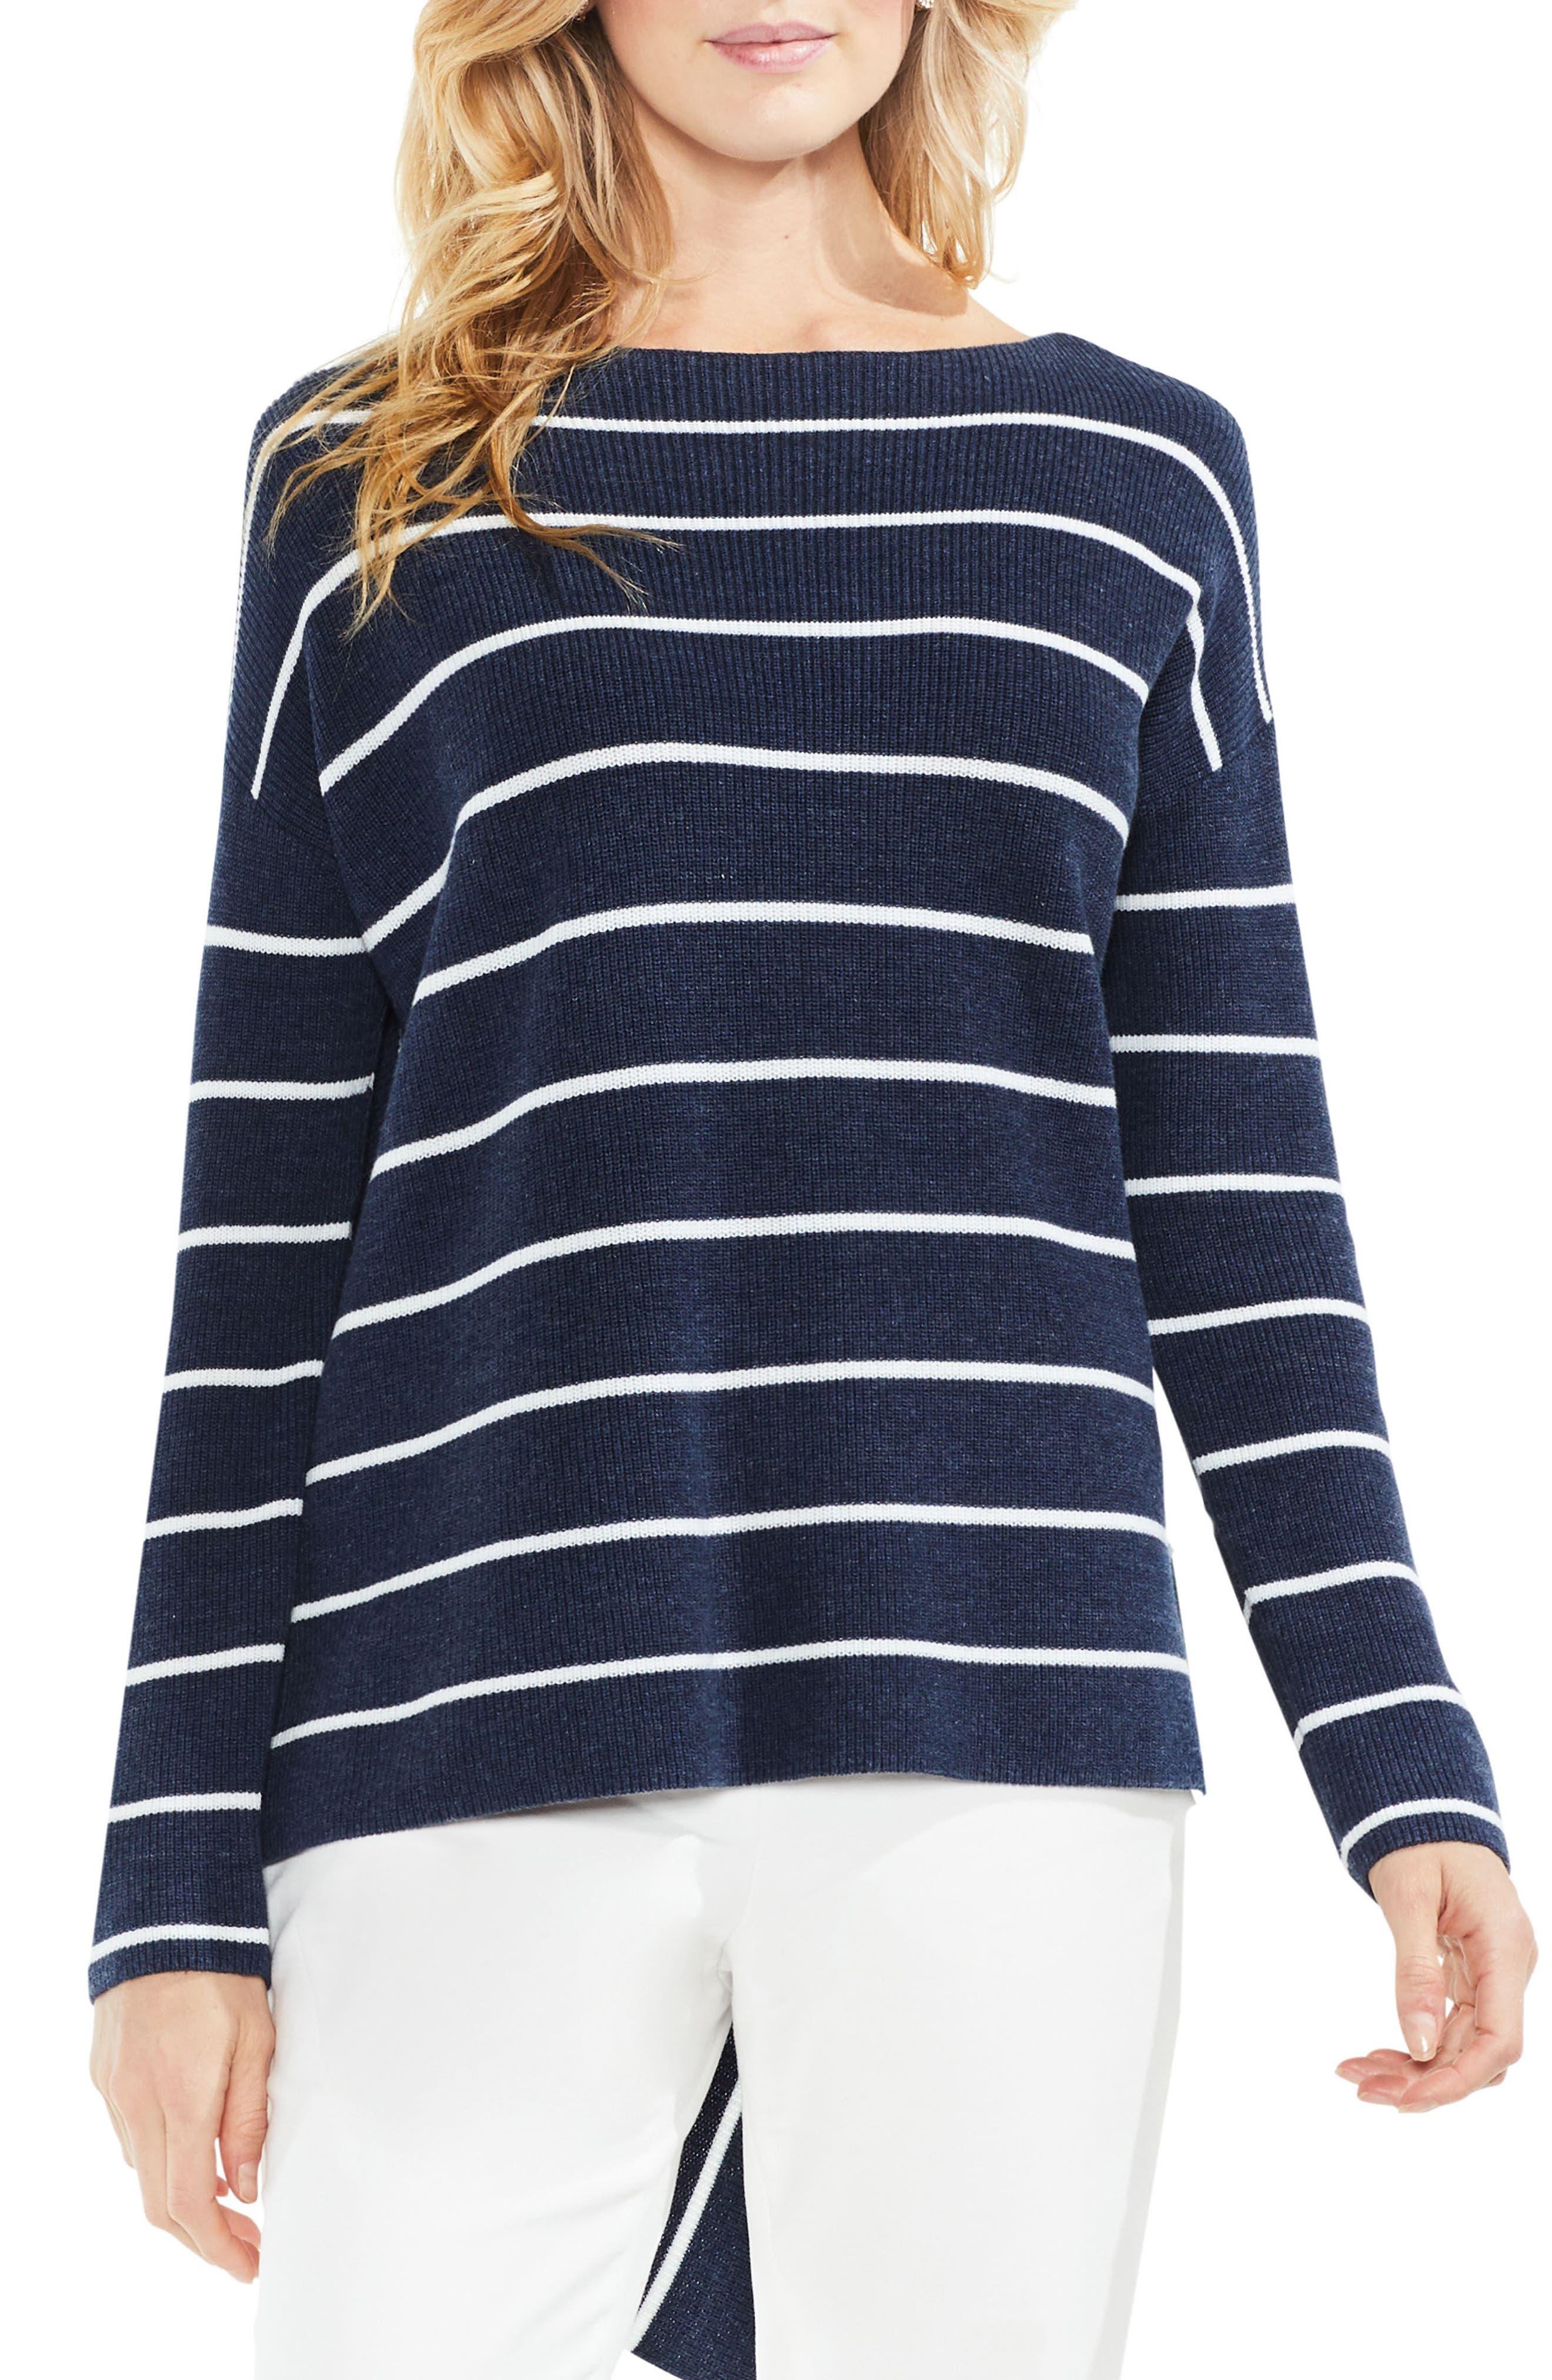 Alternate Image 1 Selected - Vince Camuto Asymmetrical Hem Stripe Sweater